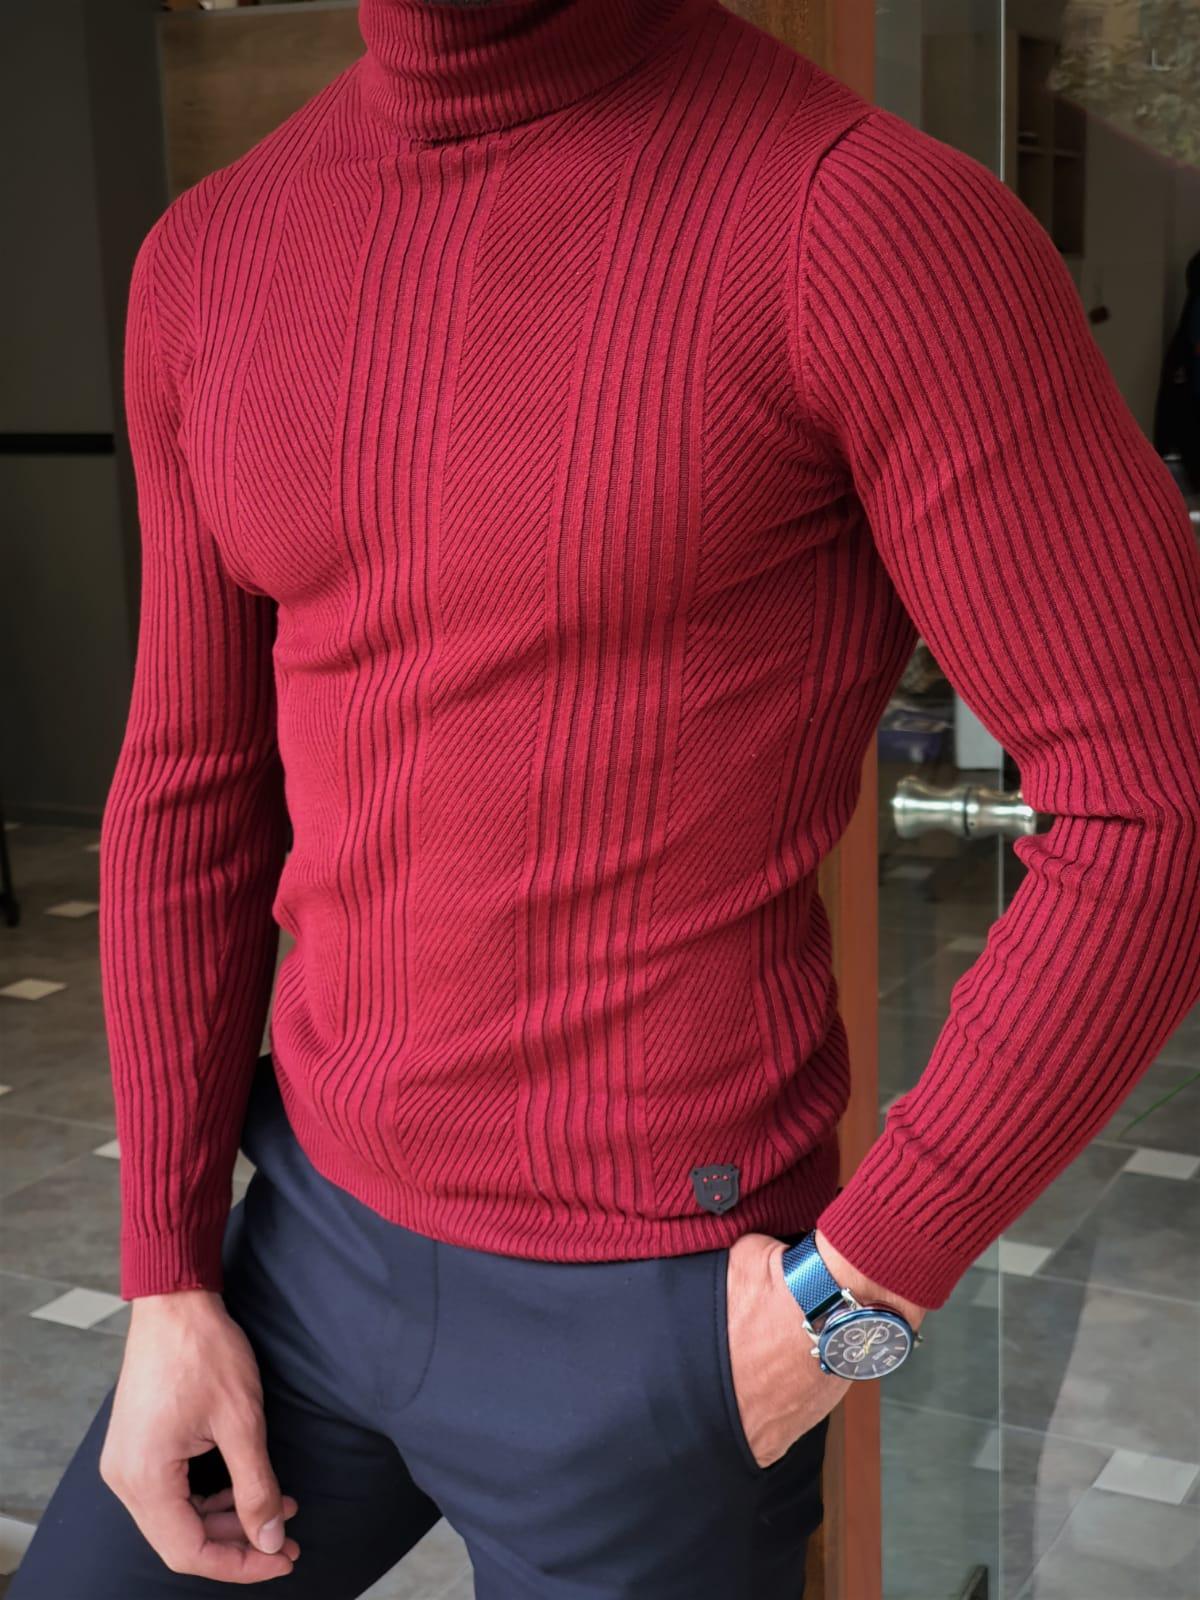 Aysoti Warren Claret Red Slim Fit Striped Turtleneck Wool Sweater